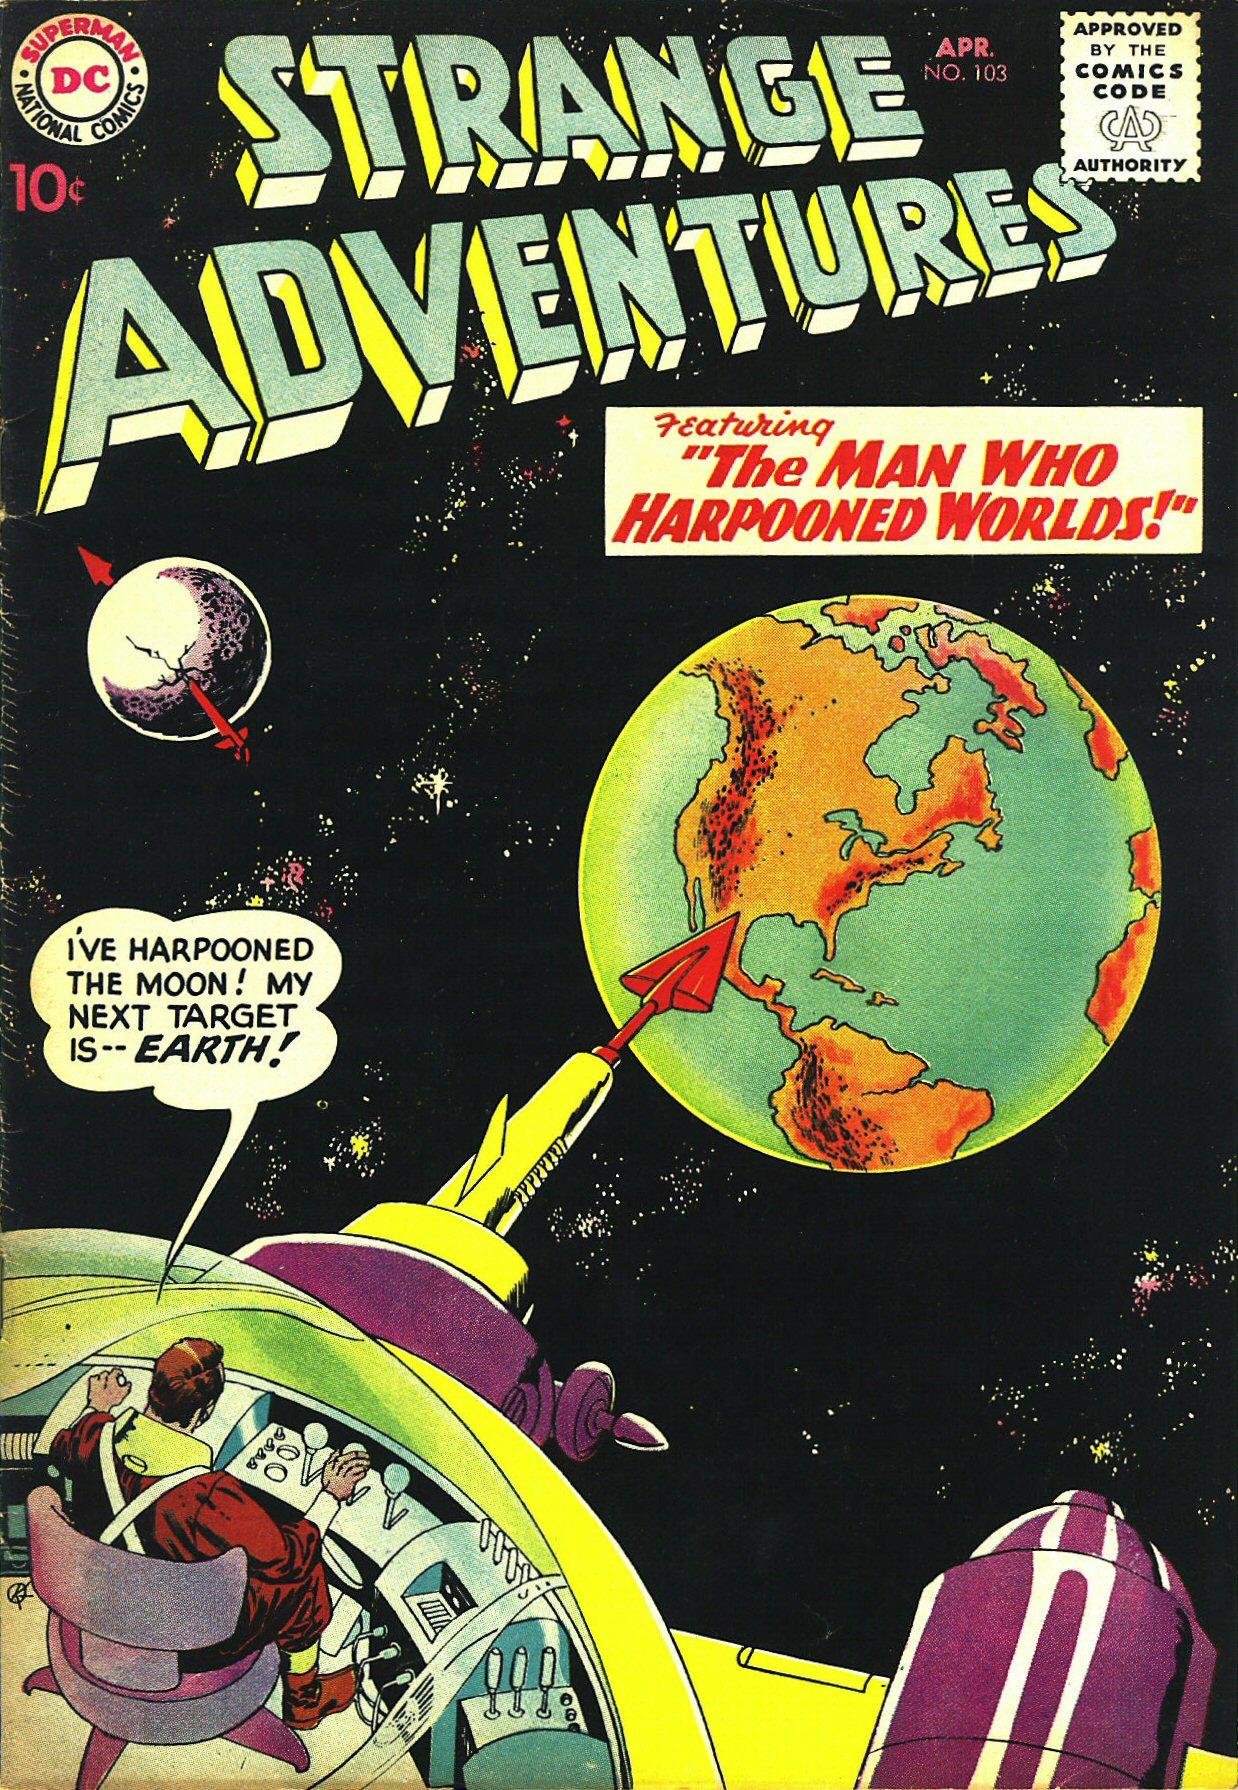 Strange Adventures (1950) issue 103 - Page 1